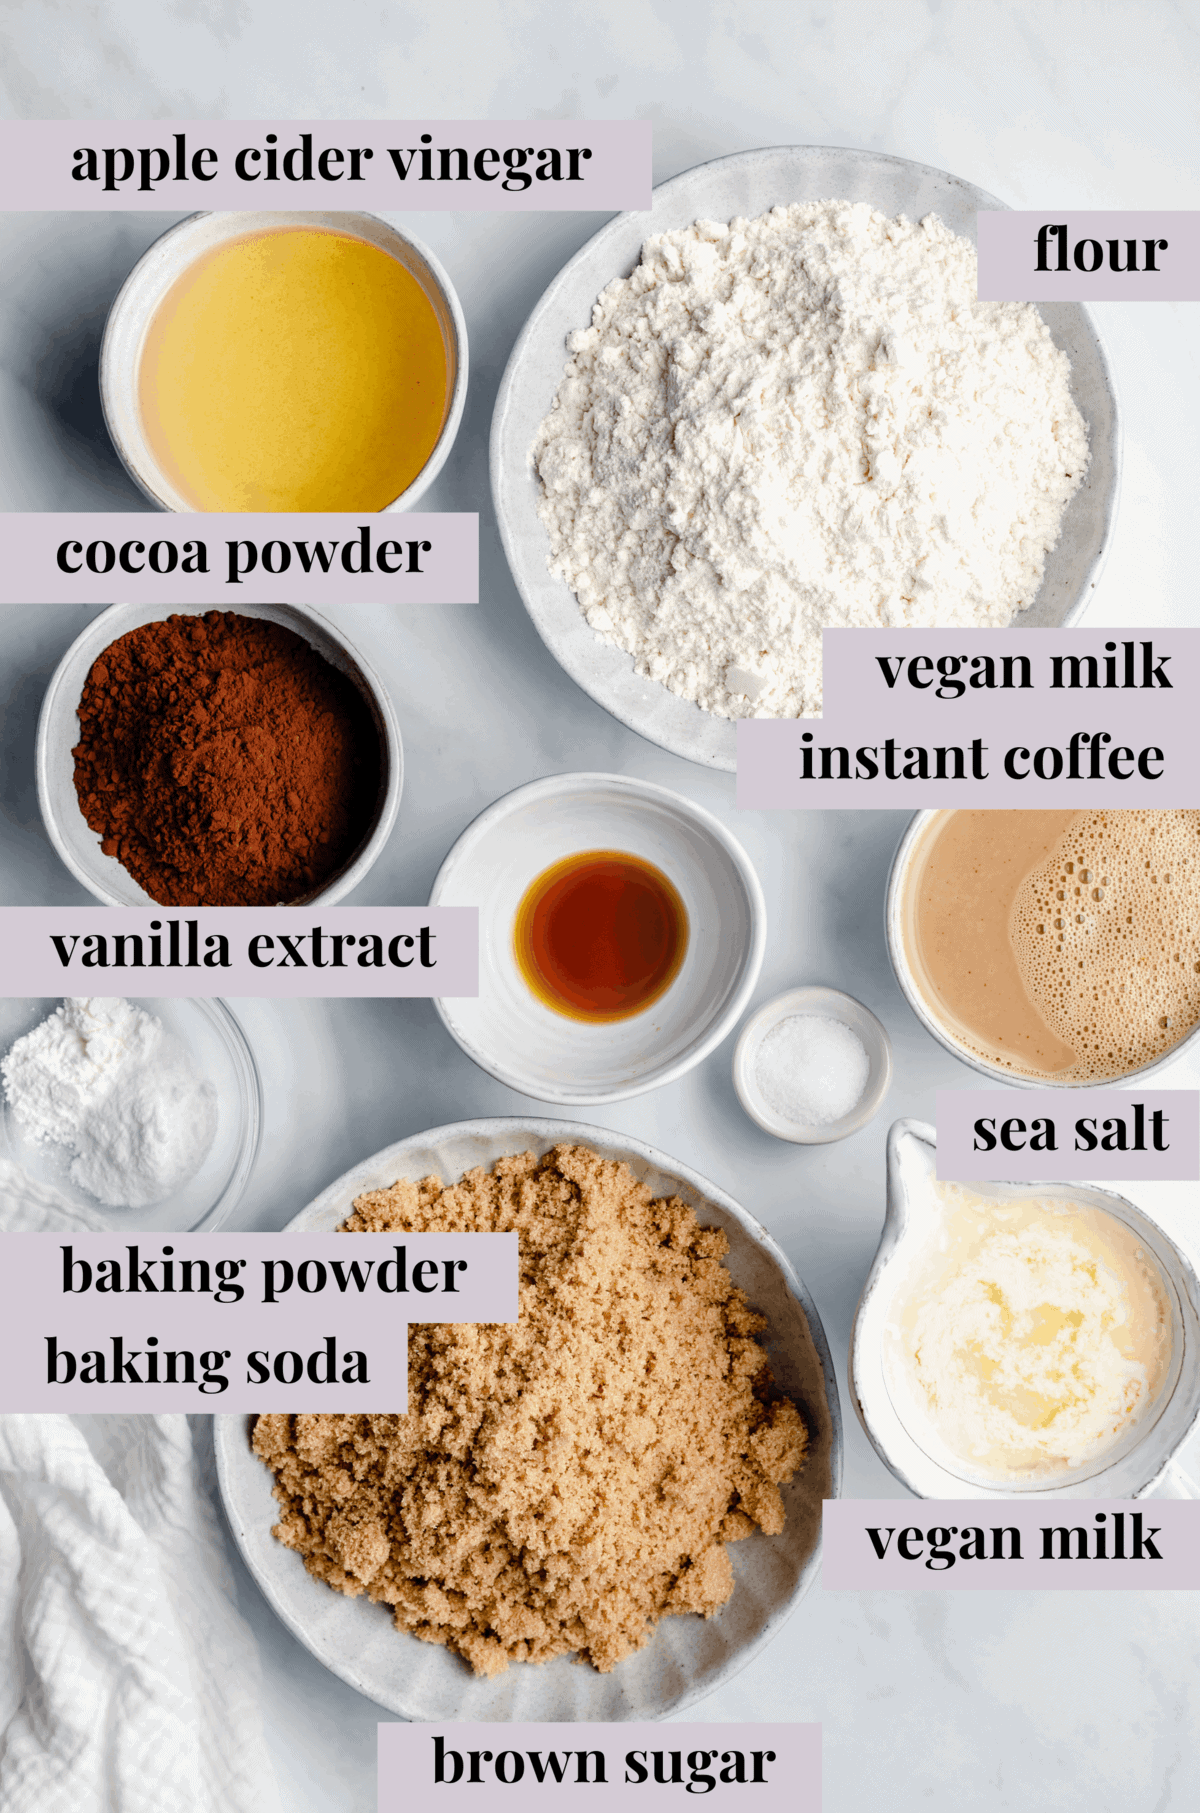 Vegan chocolate cupcakes ingredients with words